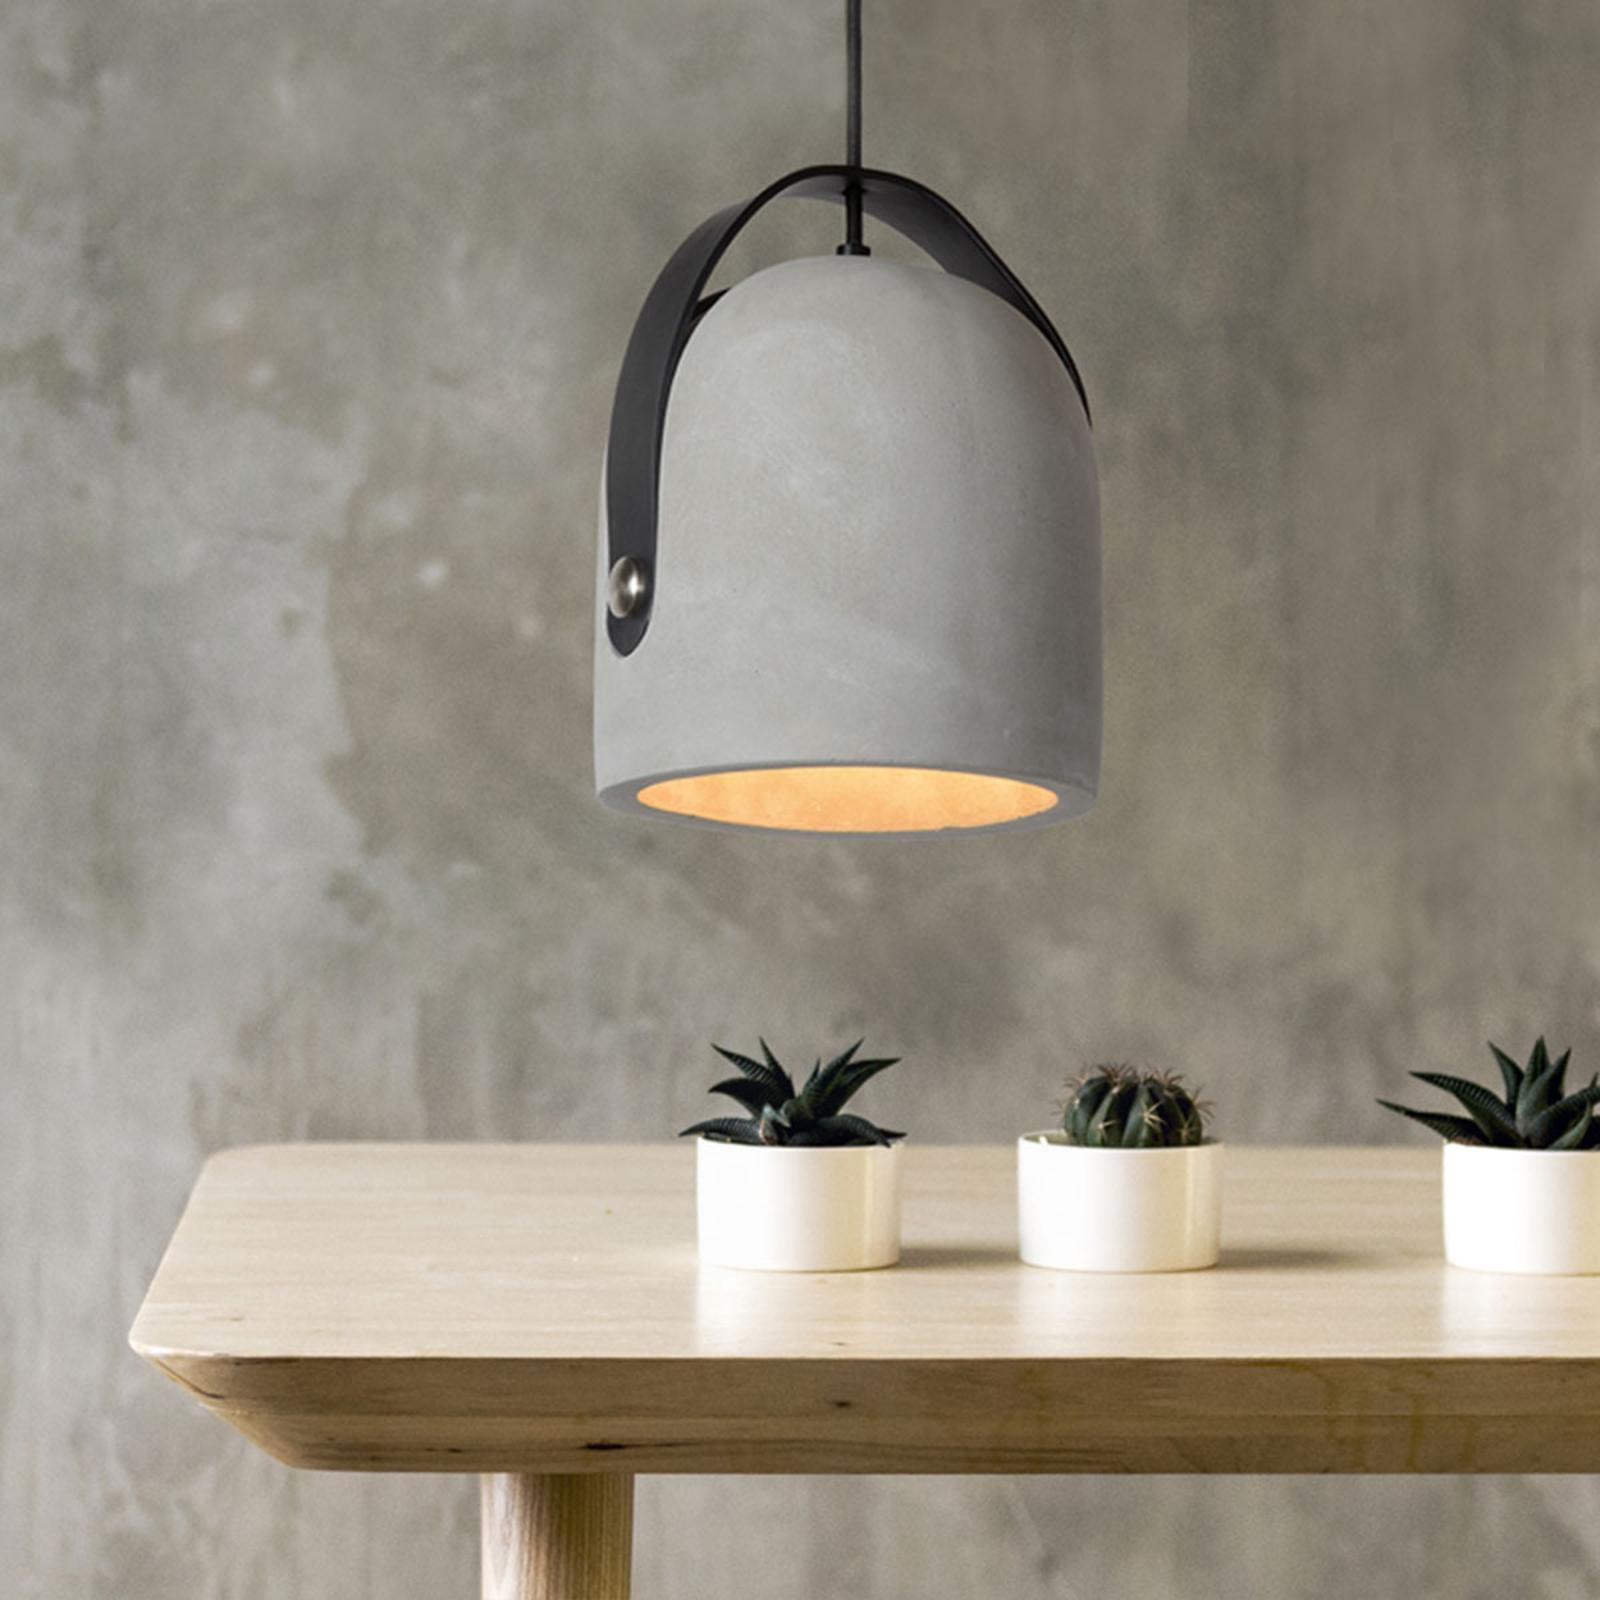 Trendy beton hanglamp Copain